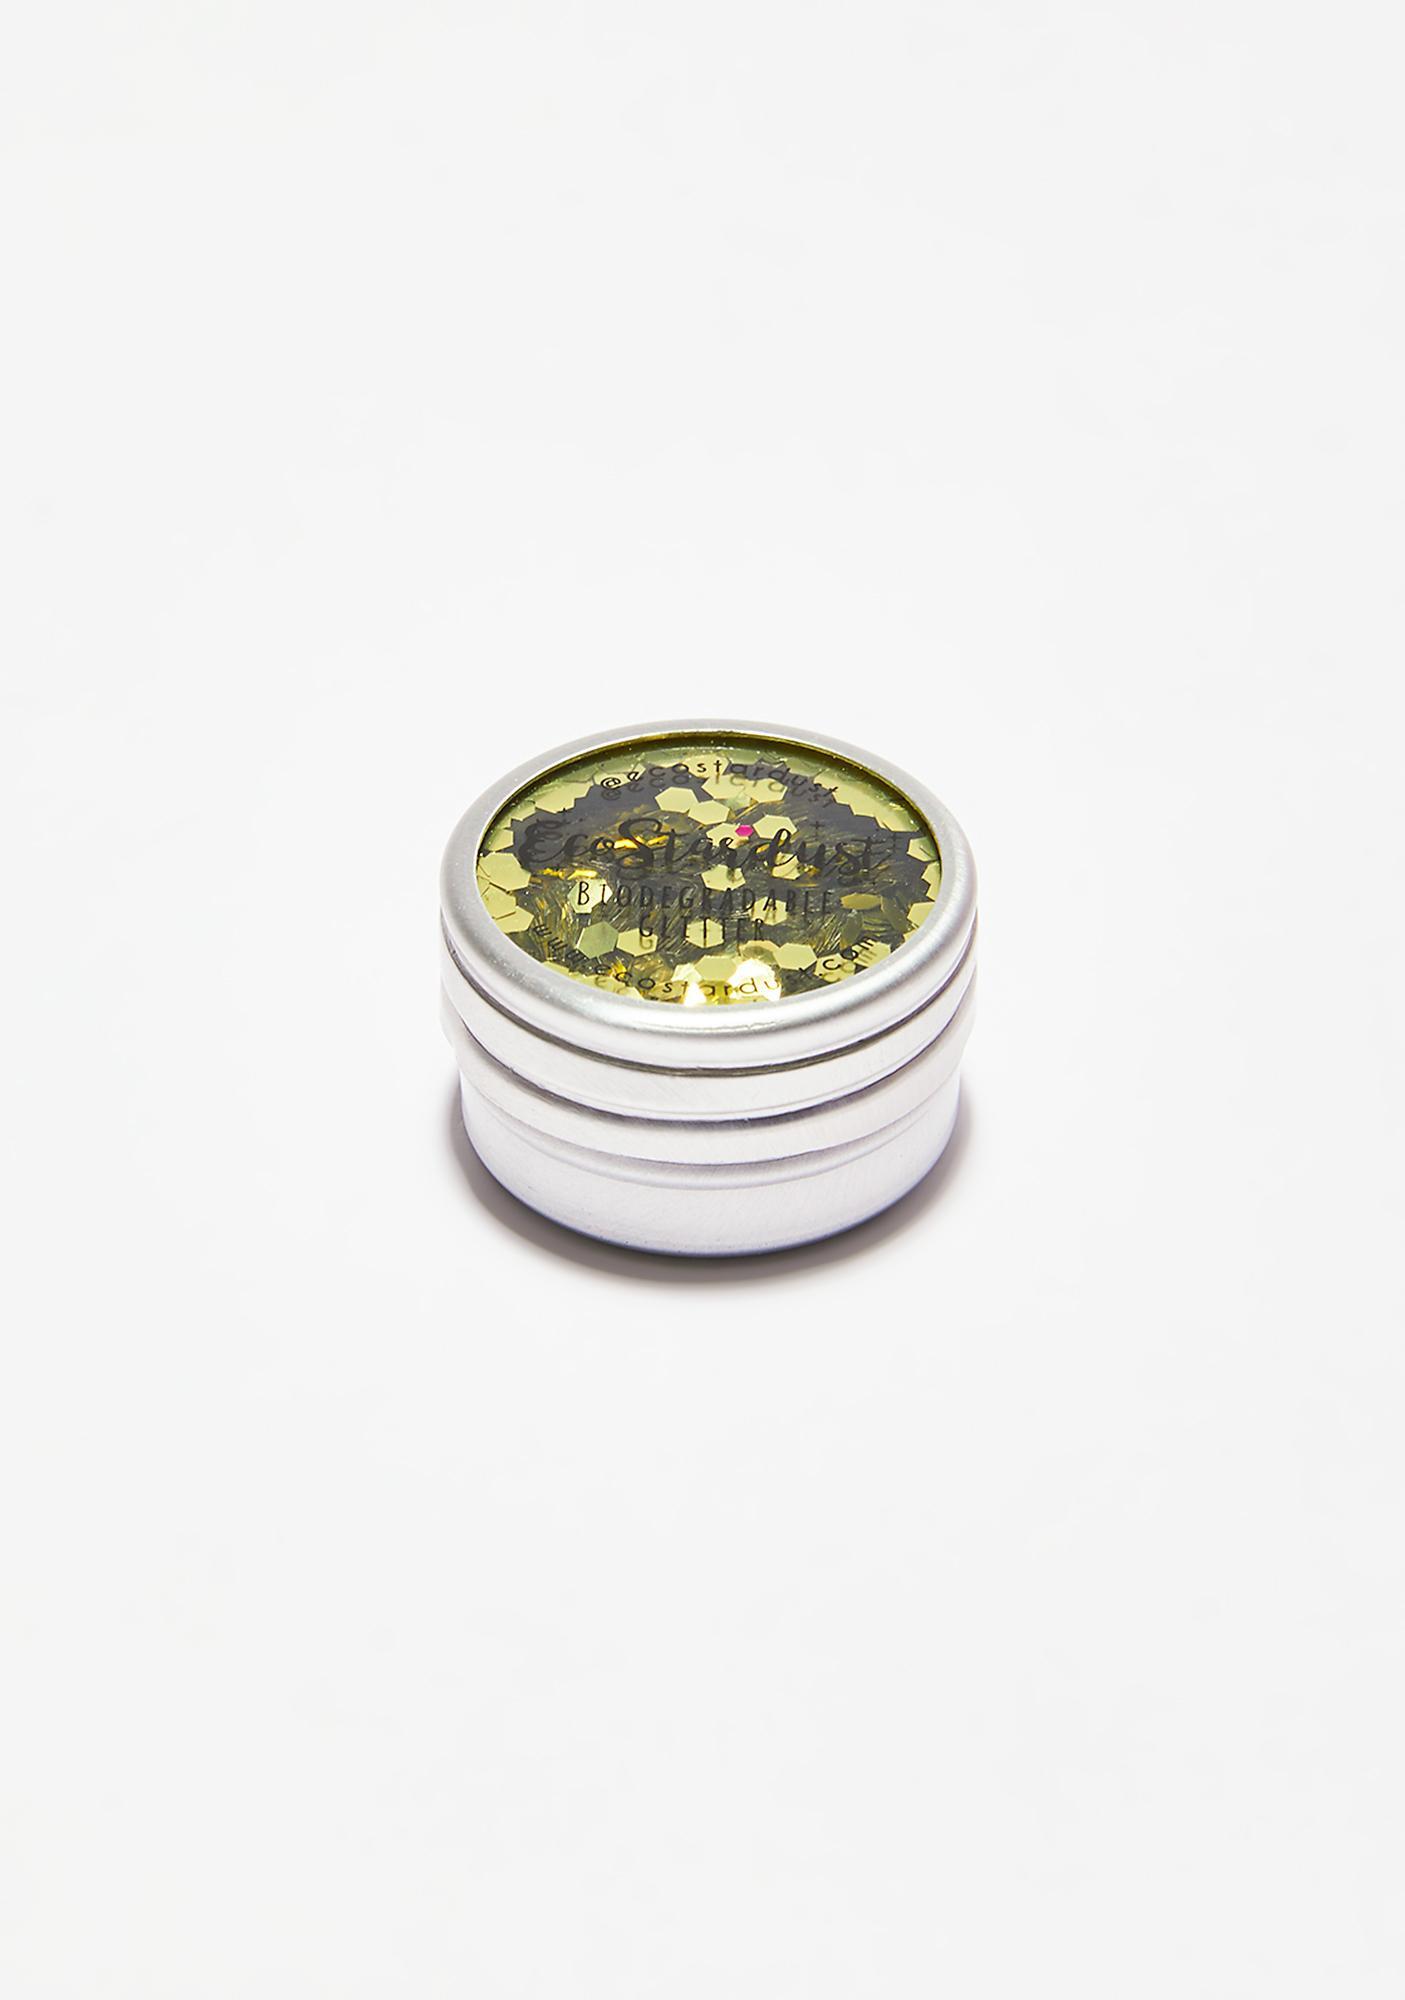 EcoStardust Ultra Chunky Biodegradable Gold Glitter